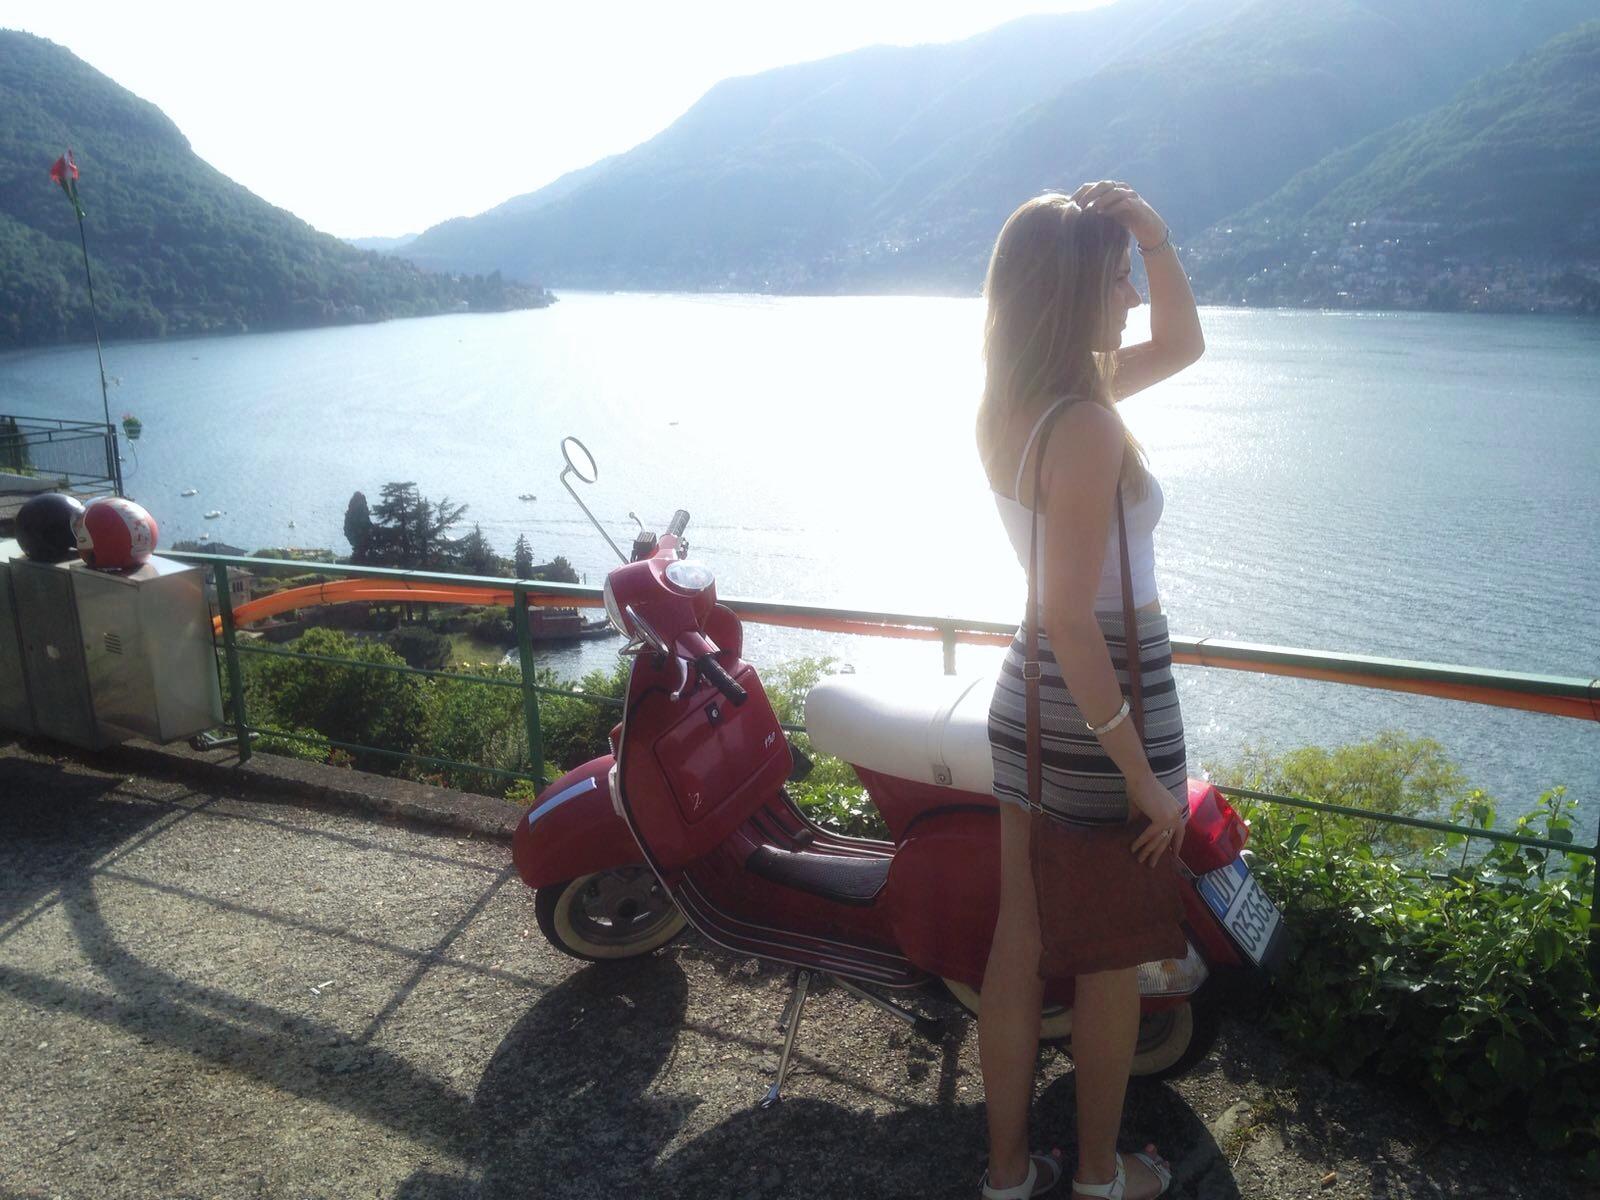 Italy, Lake Como, Vespa, fashion blogger